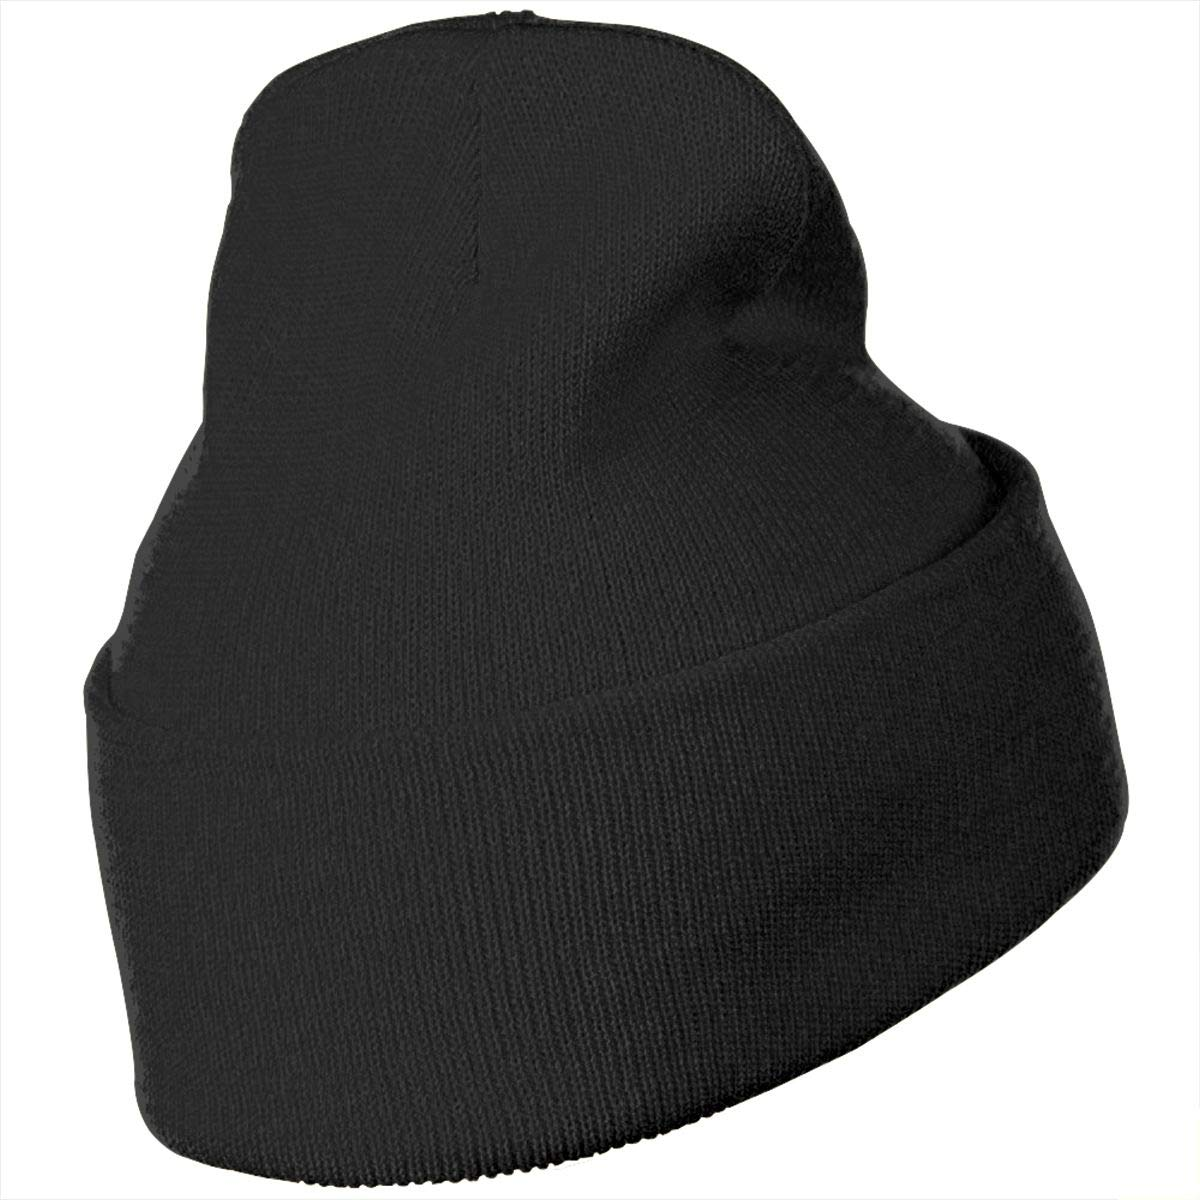 MACA Ukraine Unisex Slouch Beanie Hats Warm /& Stylish Winter Hats Black Thick